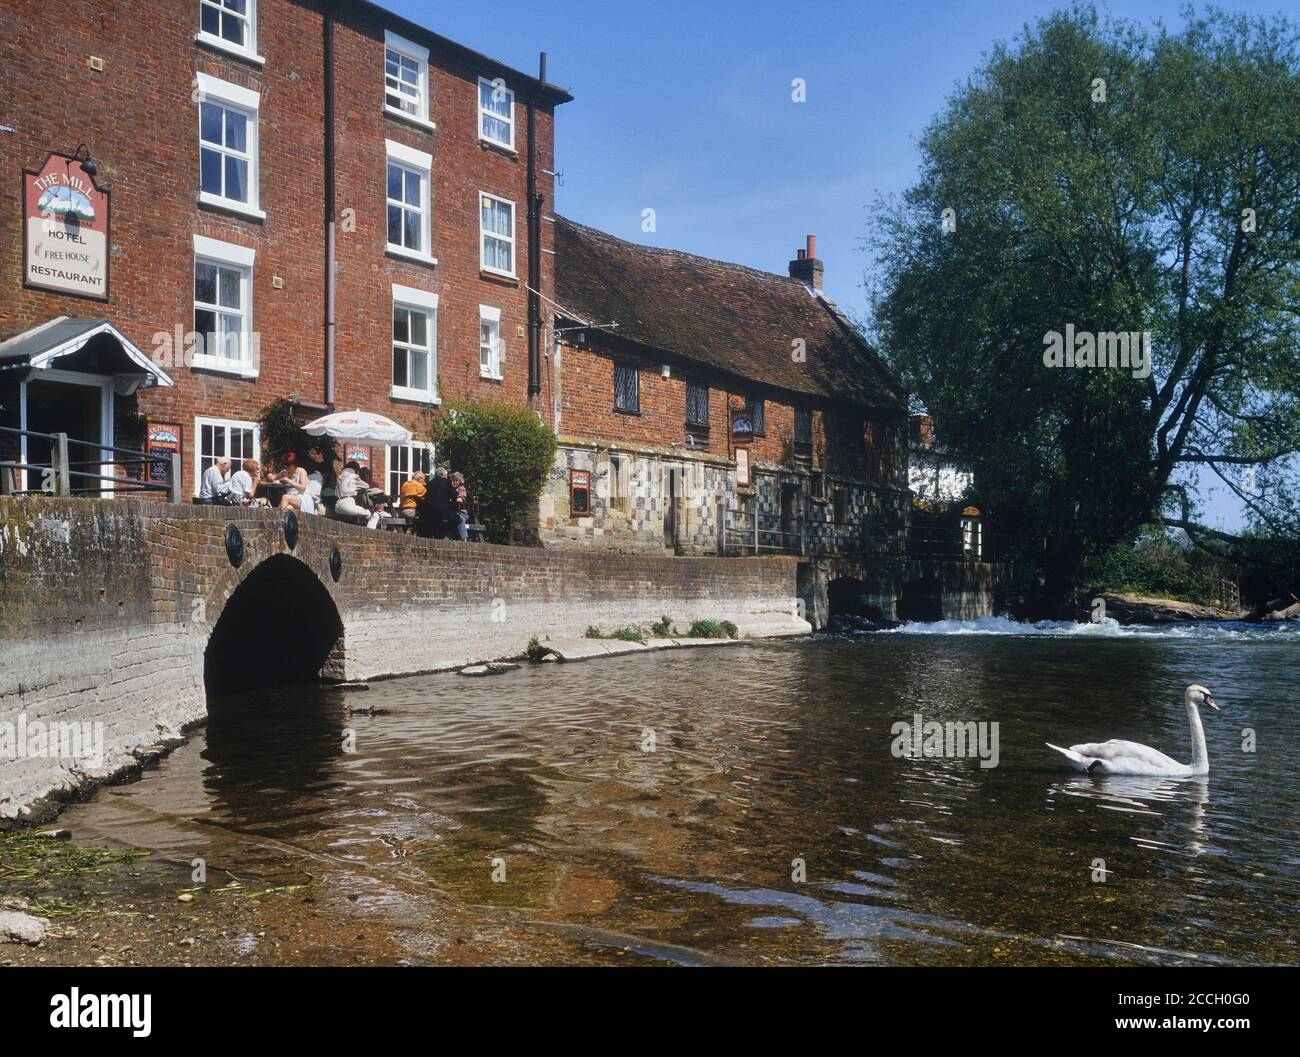 The Old Mill Hotel, restaurant & pub. West Harnham, Salisbury. Wiltshire. England. UK. Circa 1990's Stock Photo